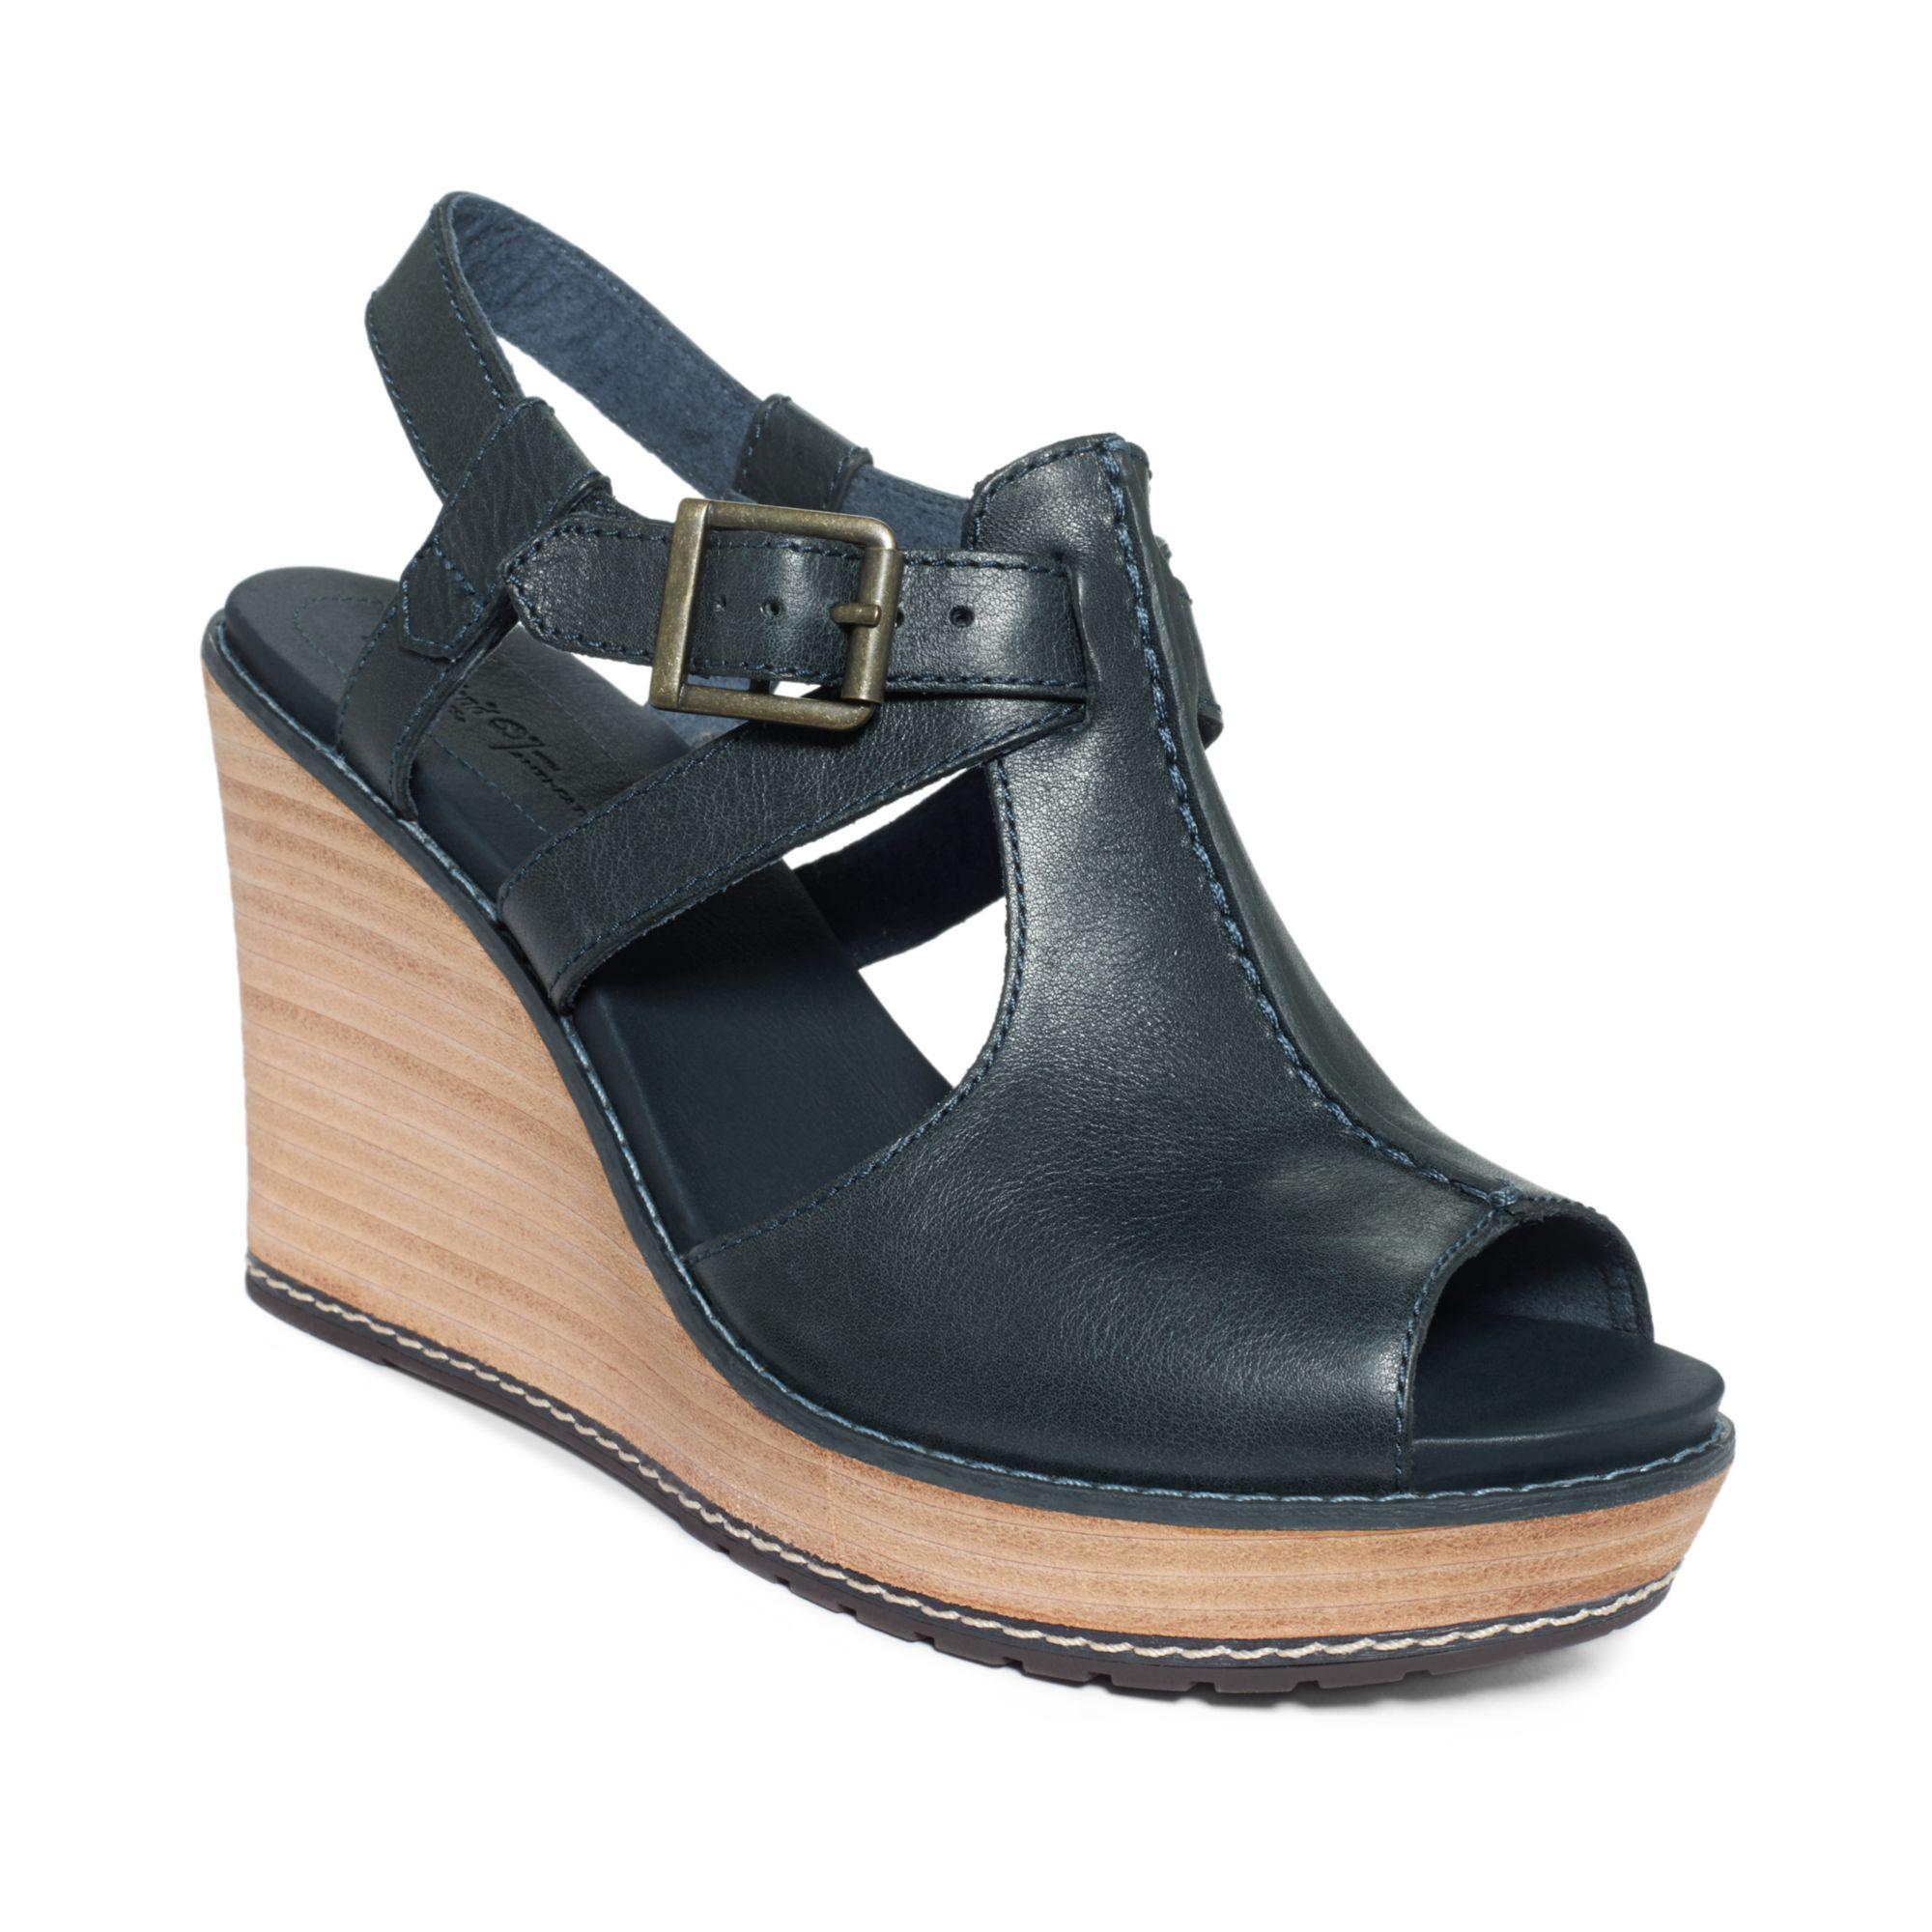 Lyst - Timberland Womens Danforth Platform Wedge Sandals ...